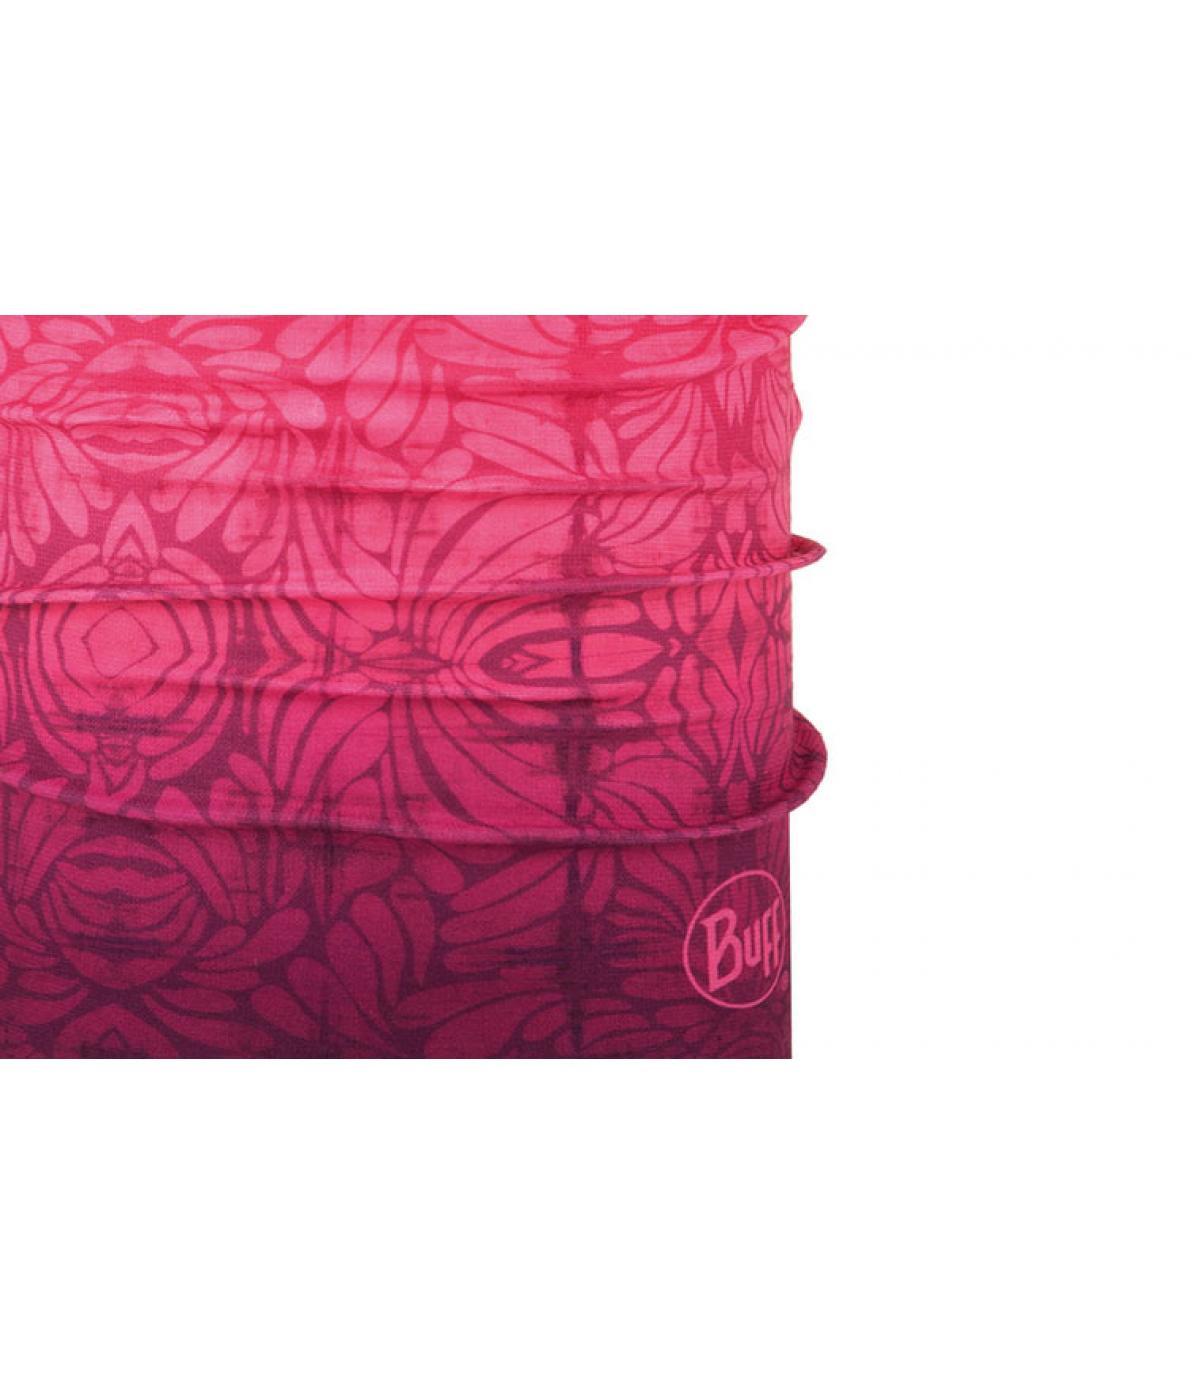 Detalles Original Boronia Pink imagen 2